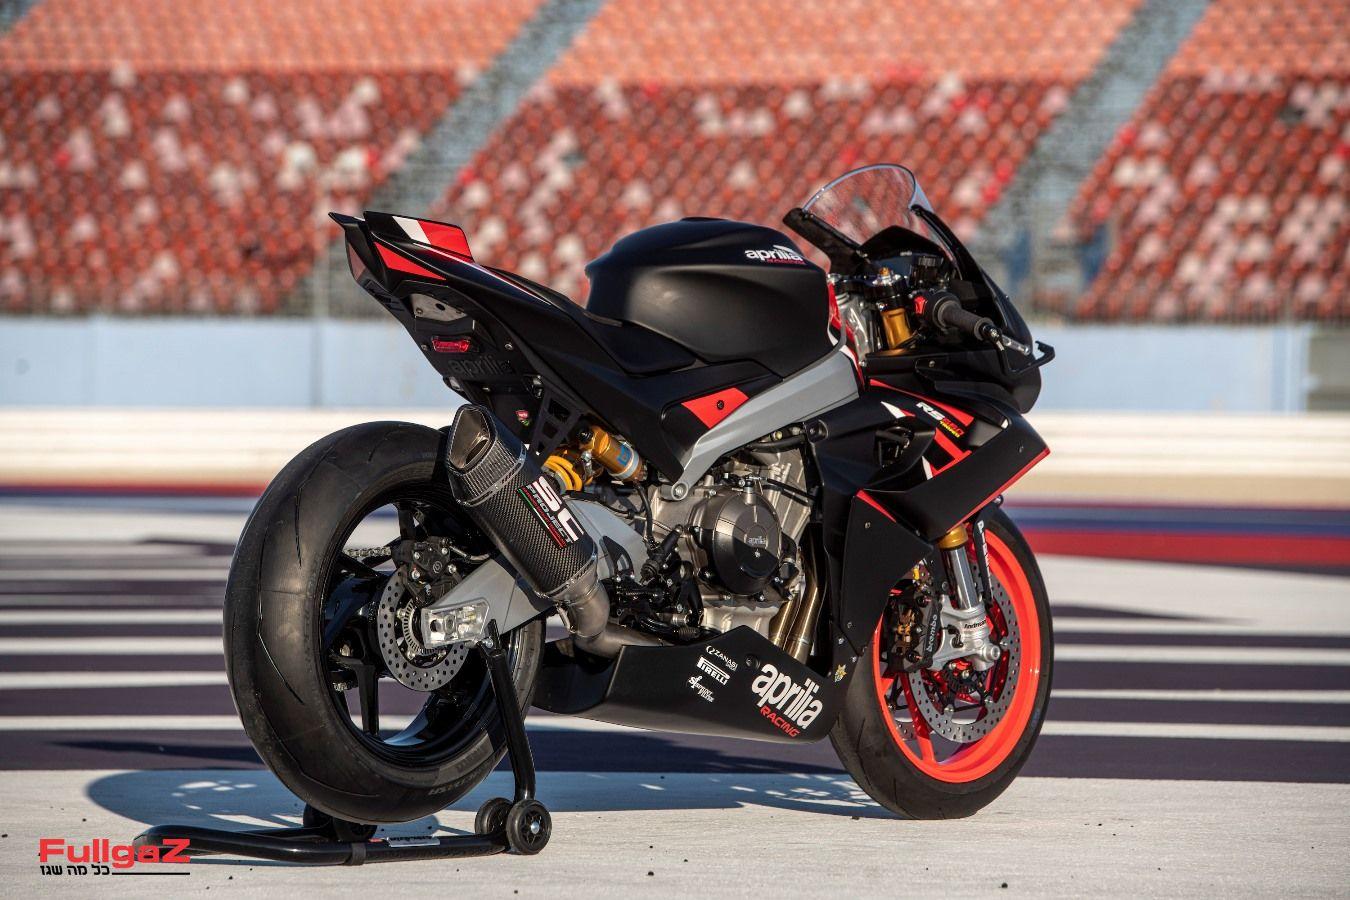 03_RS 660 Trofeo